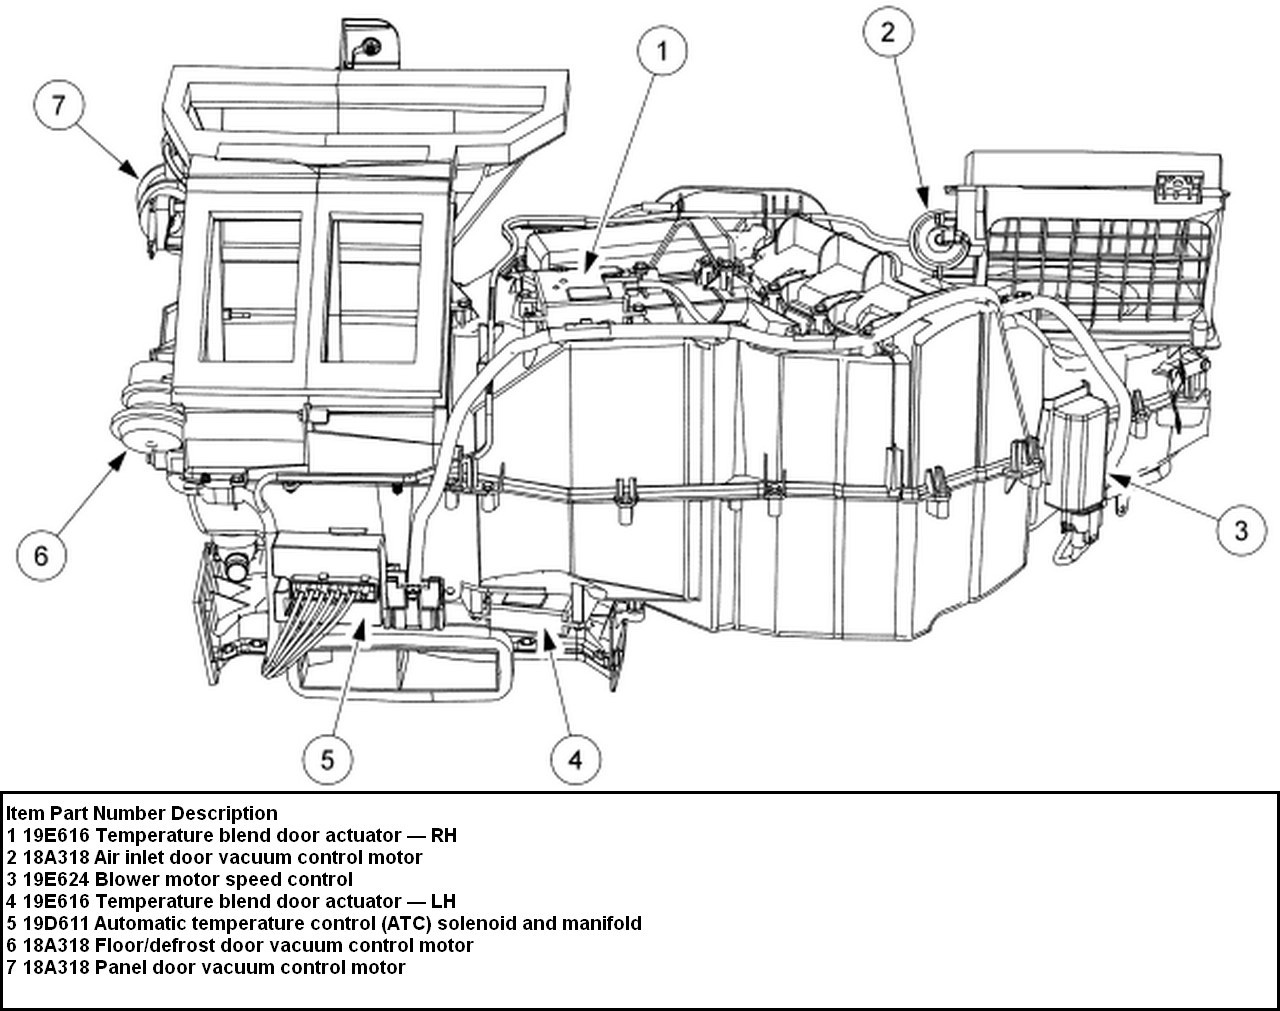 2004 f150 blend door diagram wiring schematic zt 0125  maf sensor wiring diagram in addition ford f 150 vacuum  maf sensor wiring diagram in addition